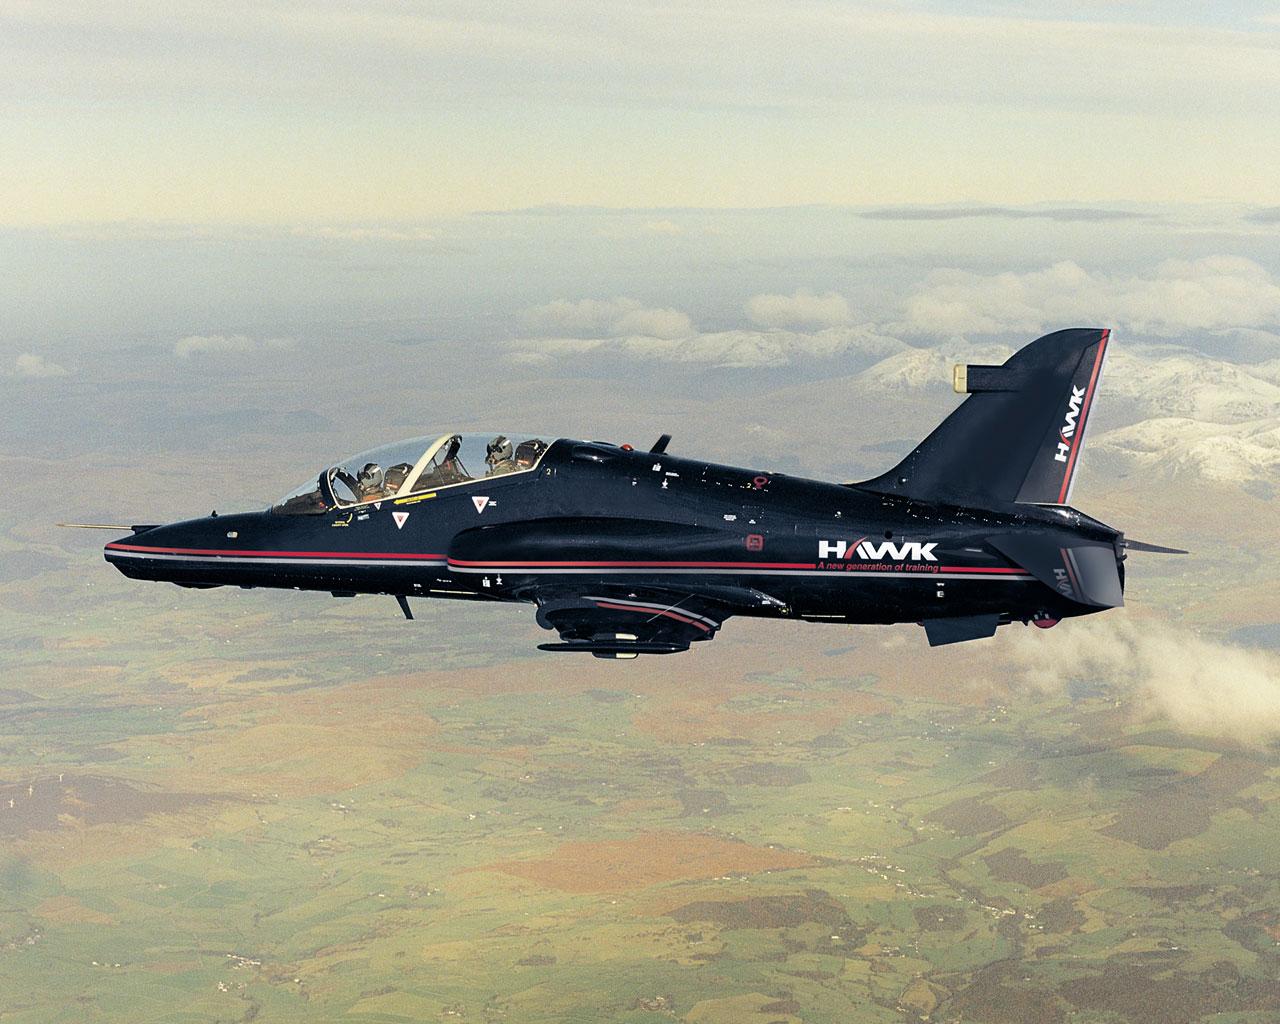 http://4.bp.blogspot.com/_m1Z6uxpmlU8/TLteHWiTBqI/AAAAAAAAB5s/qmxZ5OU8PLw/s1600/Hawk_Advanced_Jet_Fighter_over_Pennines.jpg